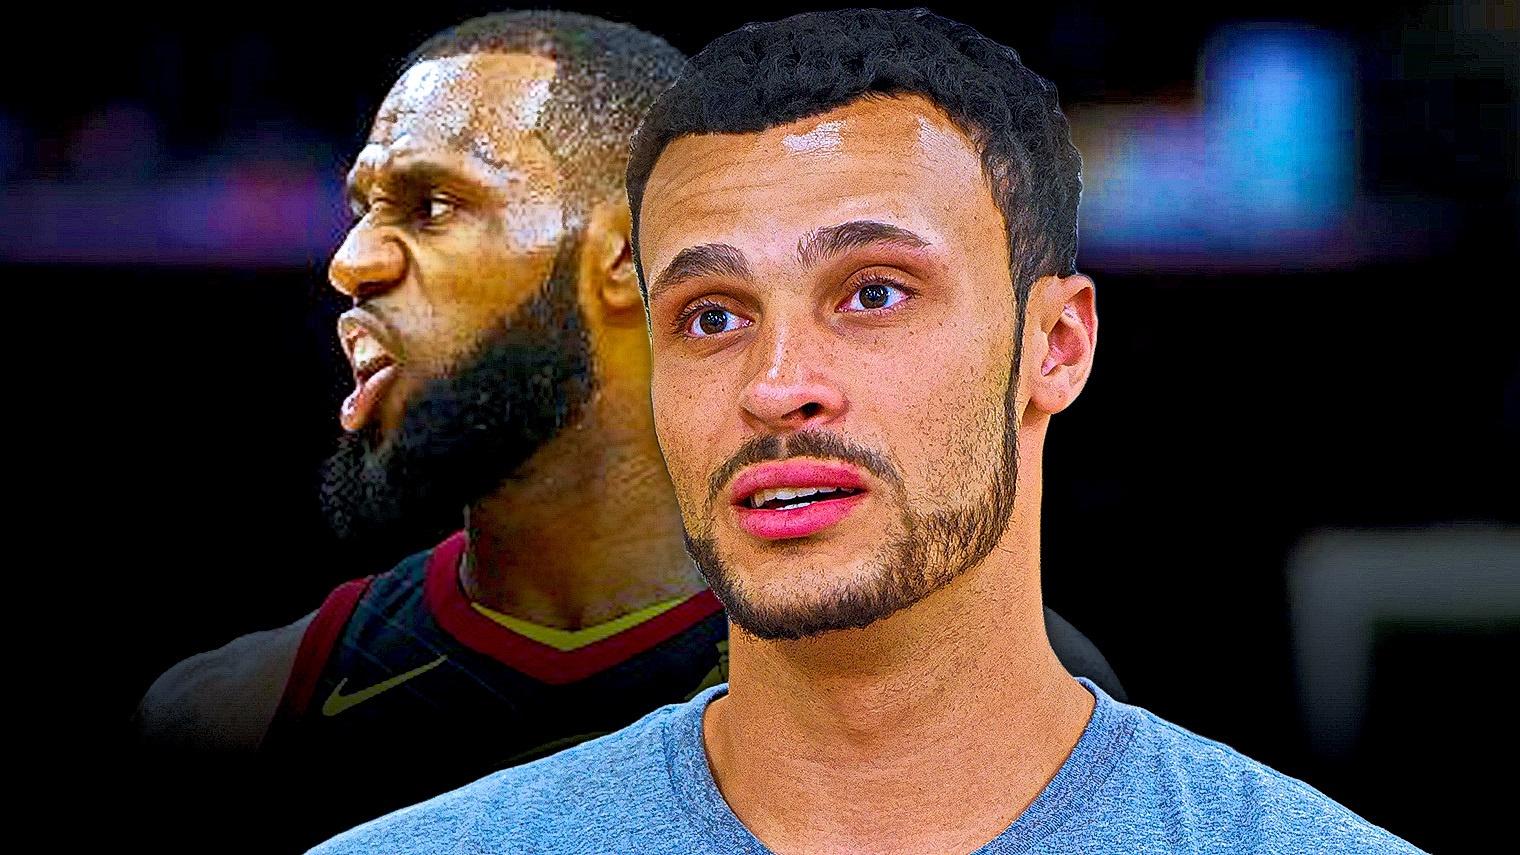 Tyronn Lue unveils new Cleveland Cavaliers' starting lineup after trade deadline deals